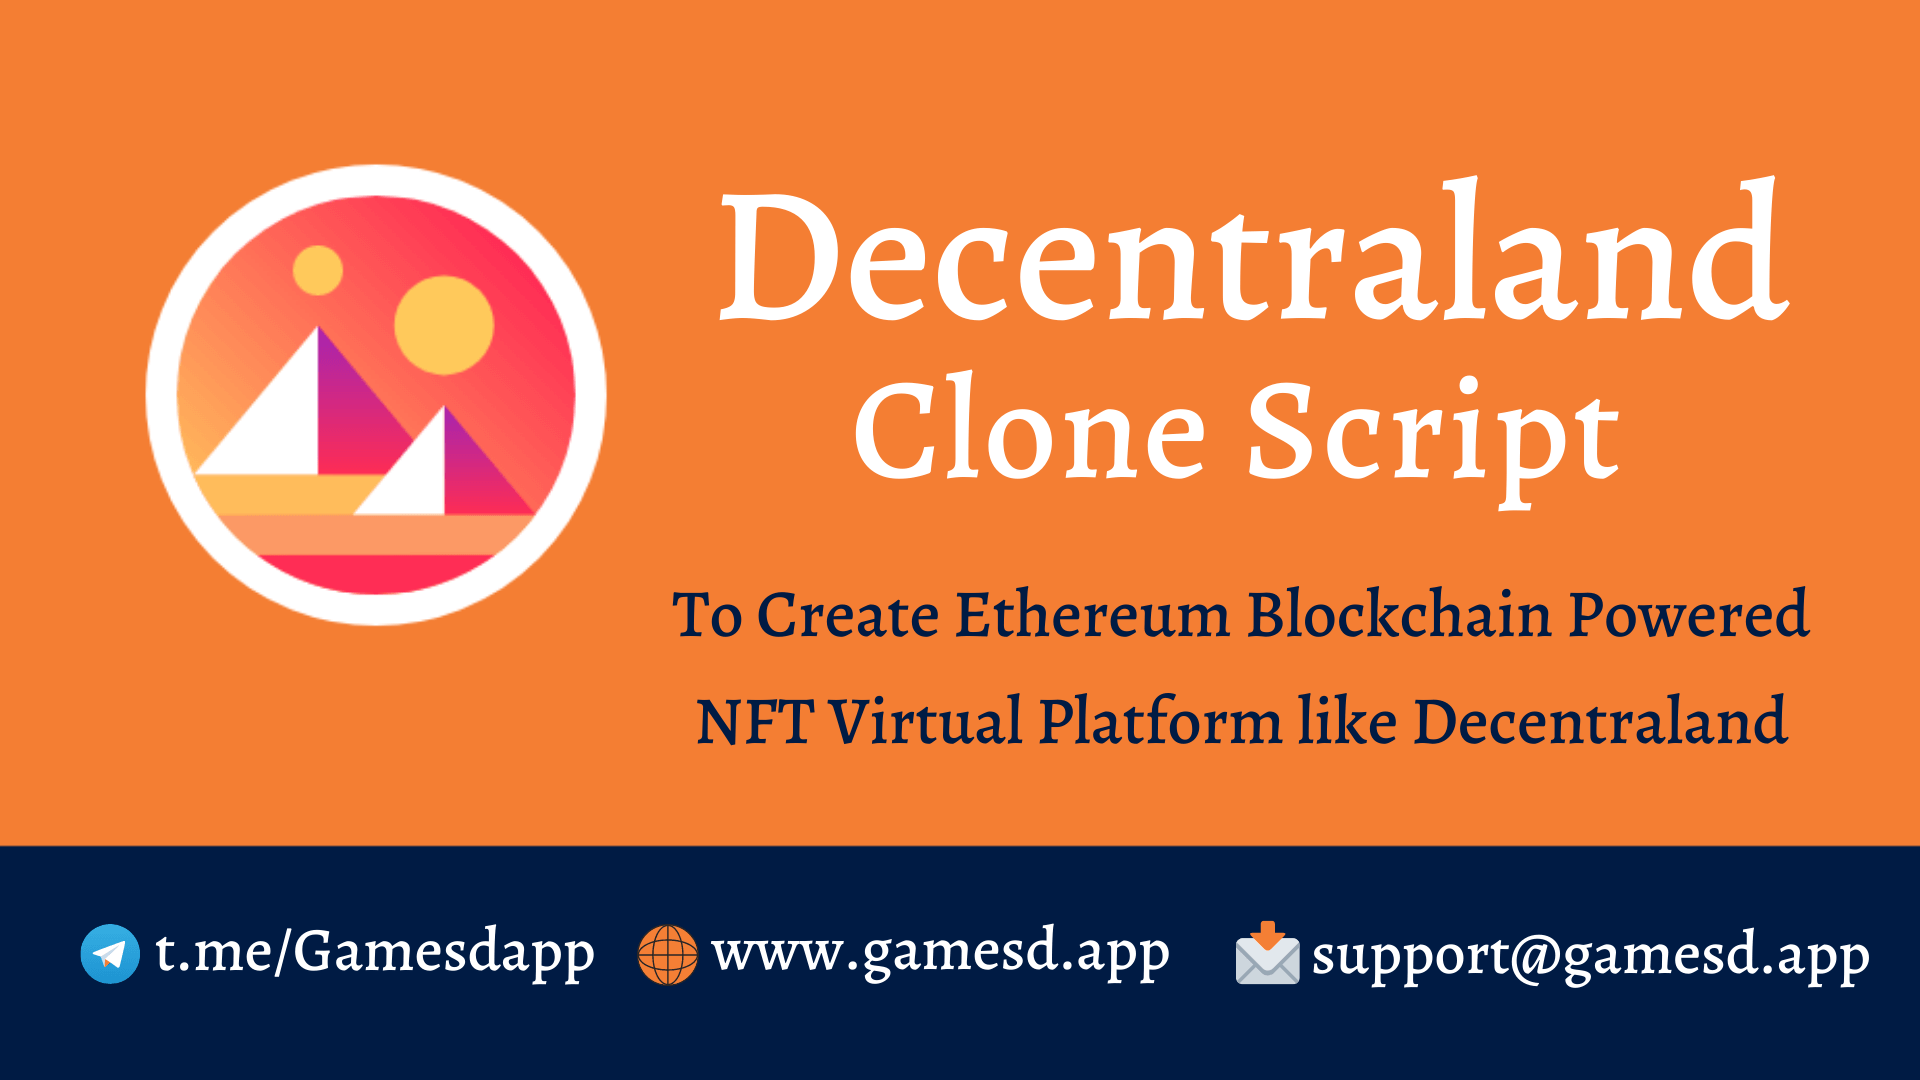 Decentraland Clone Script - To Create Ethereum Blockchain Powered NFT Virtual Platform like Decentraland